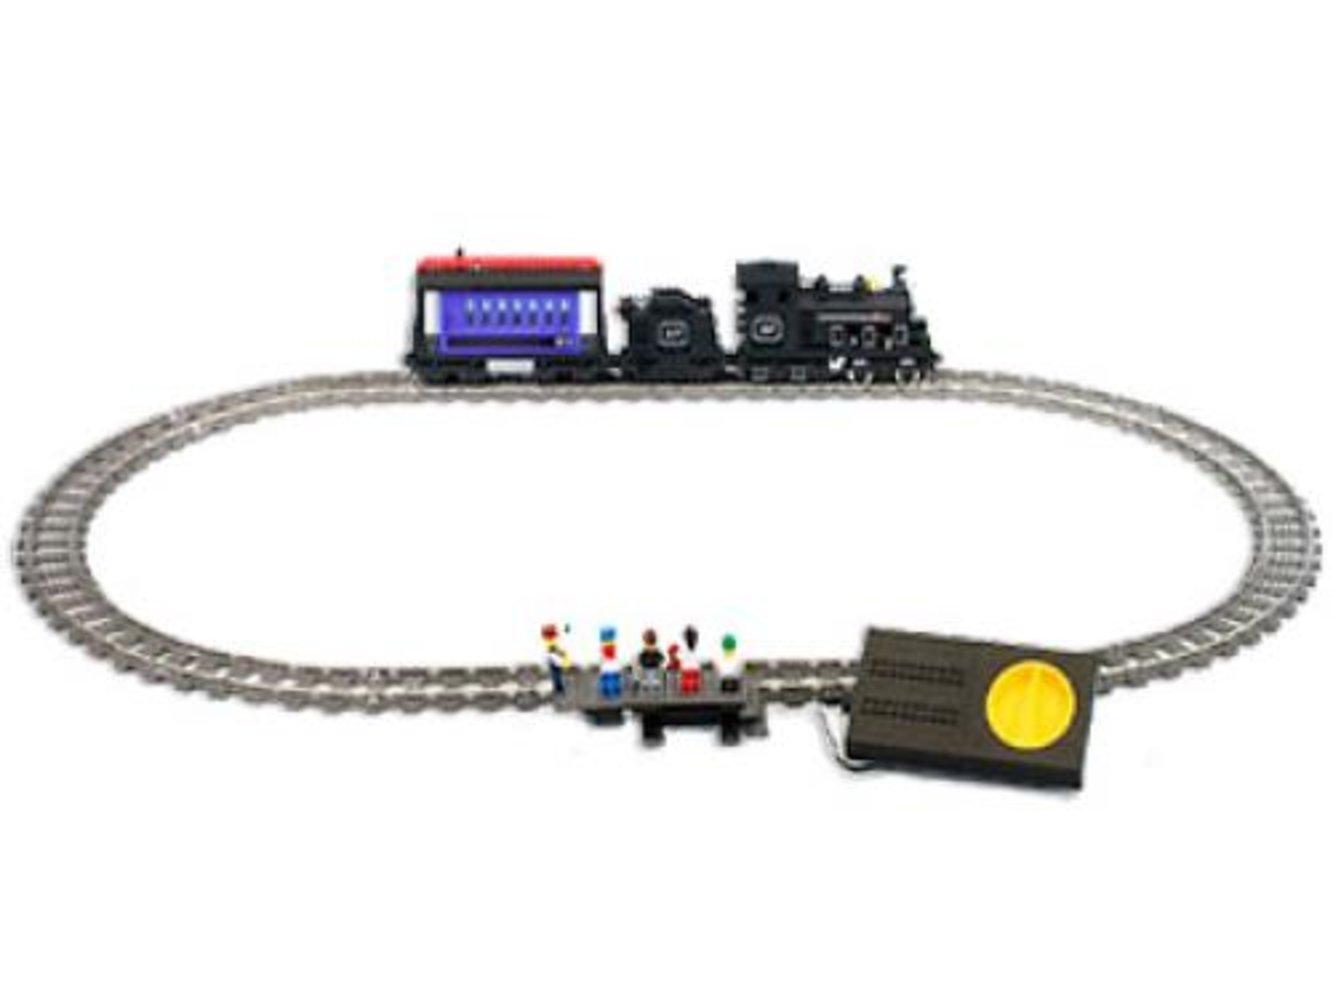 LEGO Express